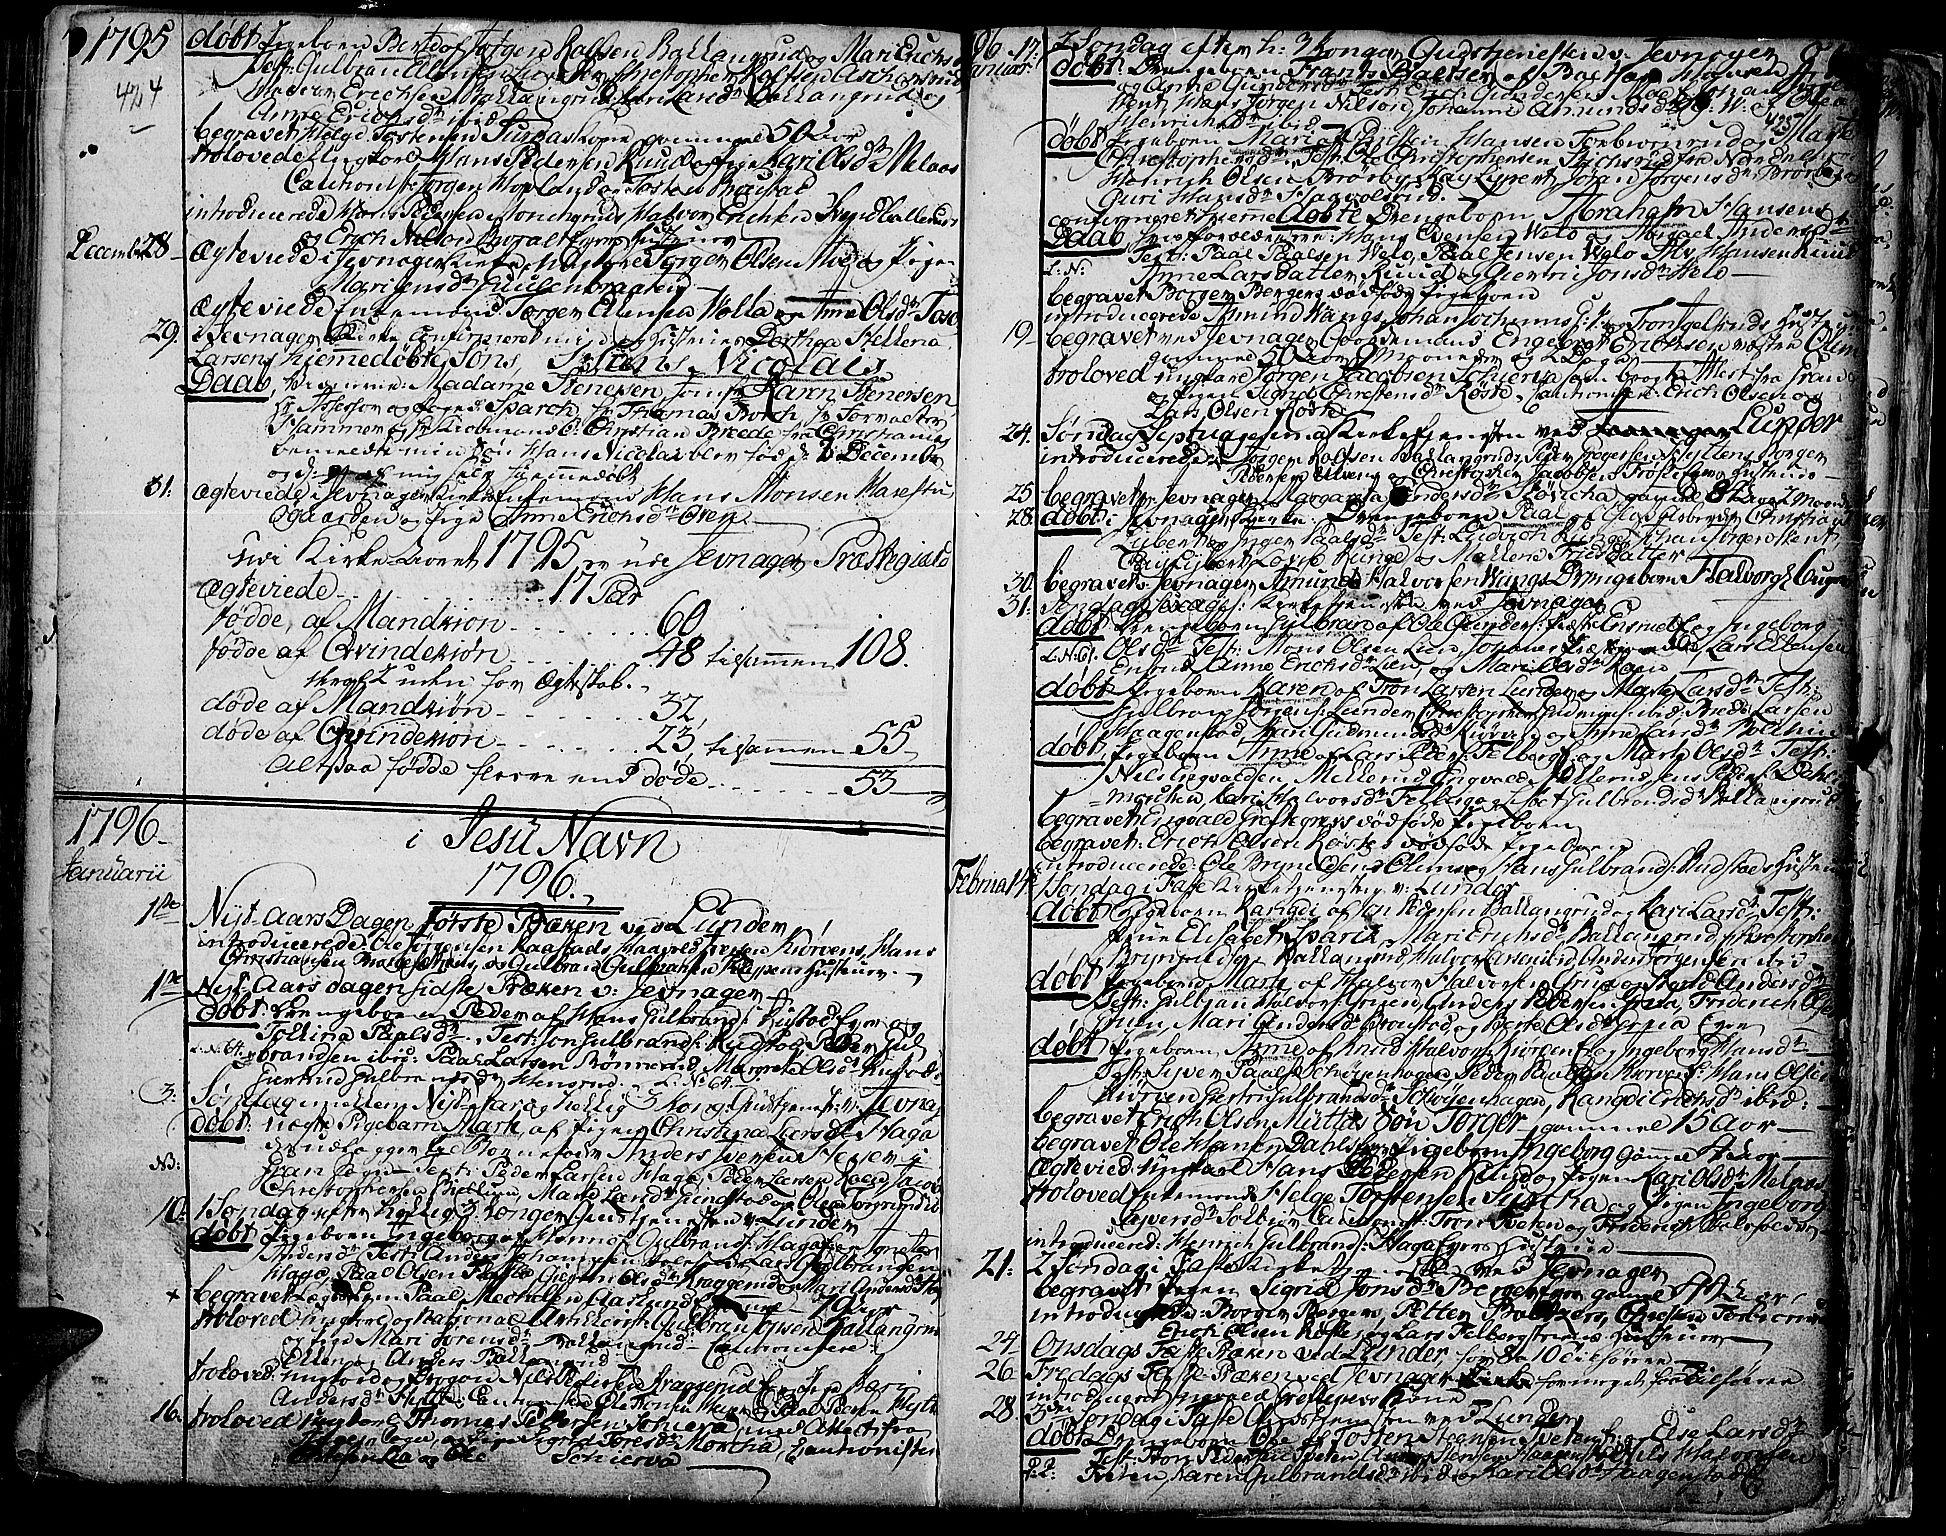 SAH, Jevnaker prestekontor, Ministerialbok nr. 3, 1752-1799, s. 424-425